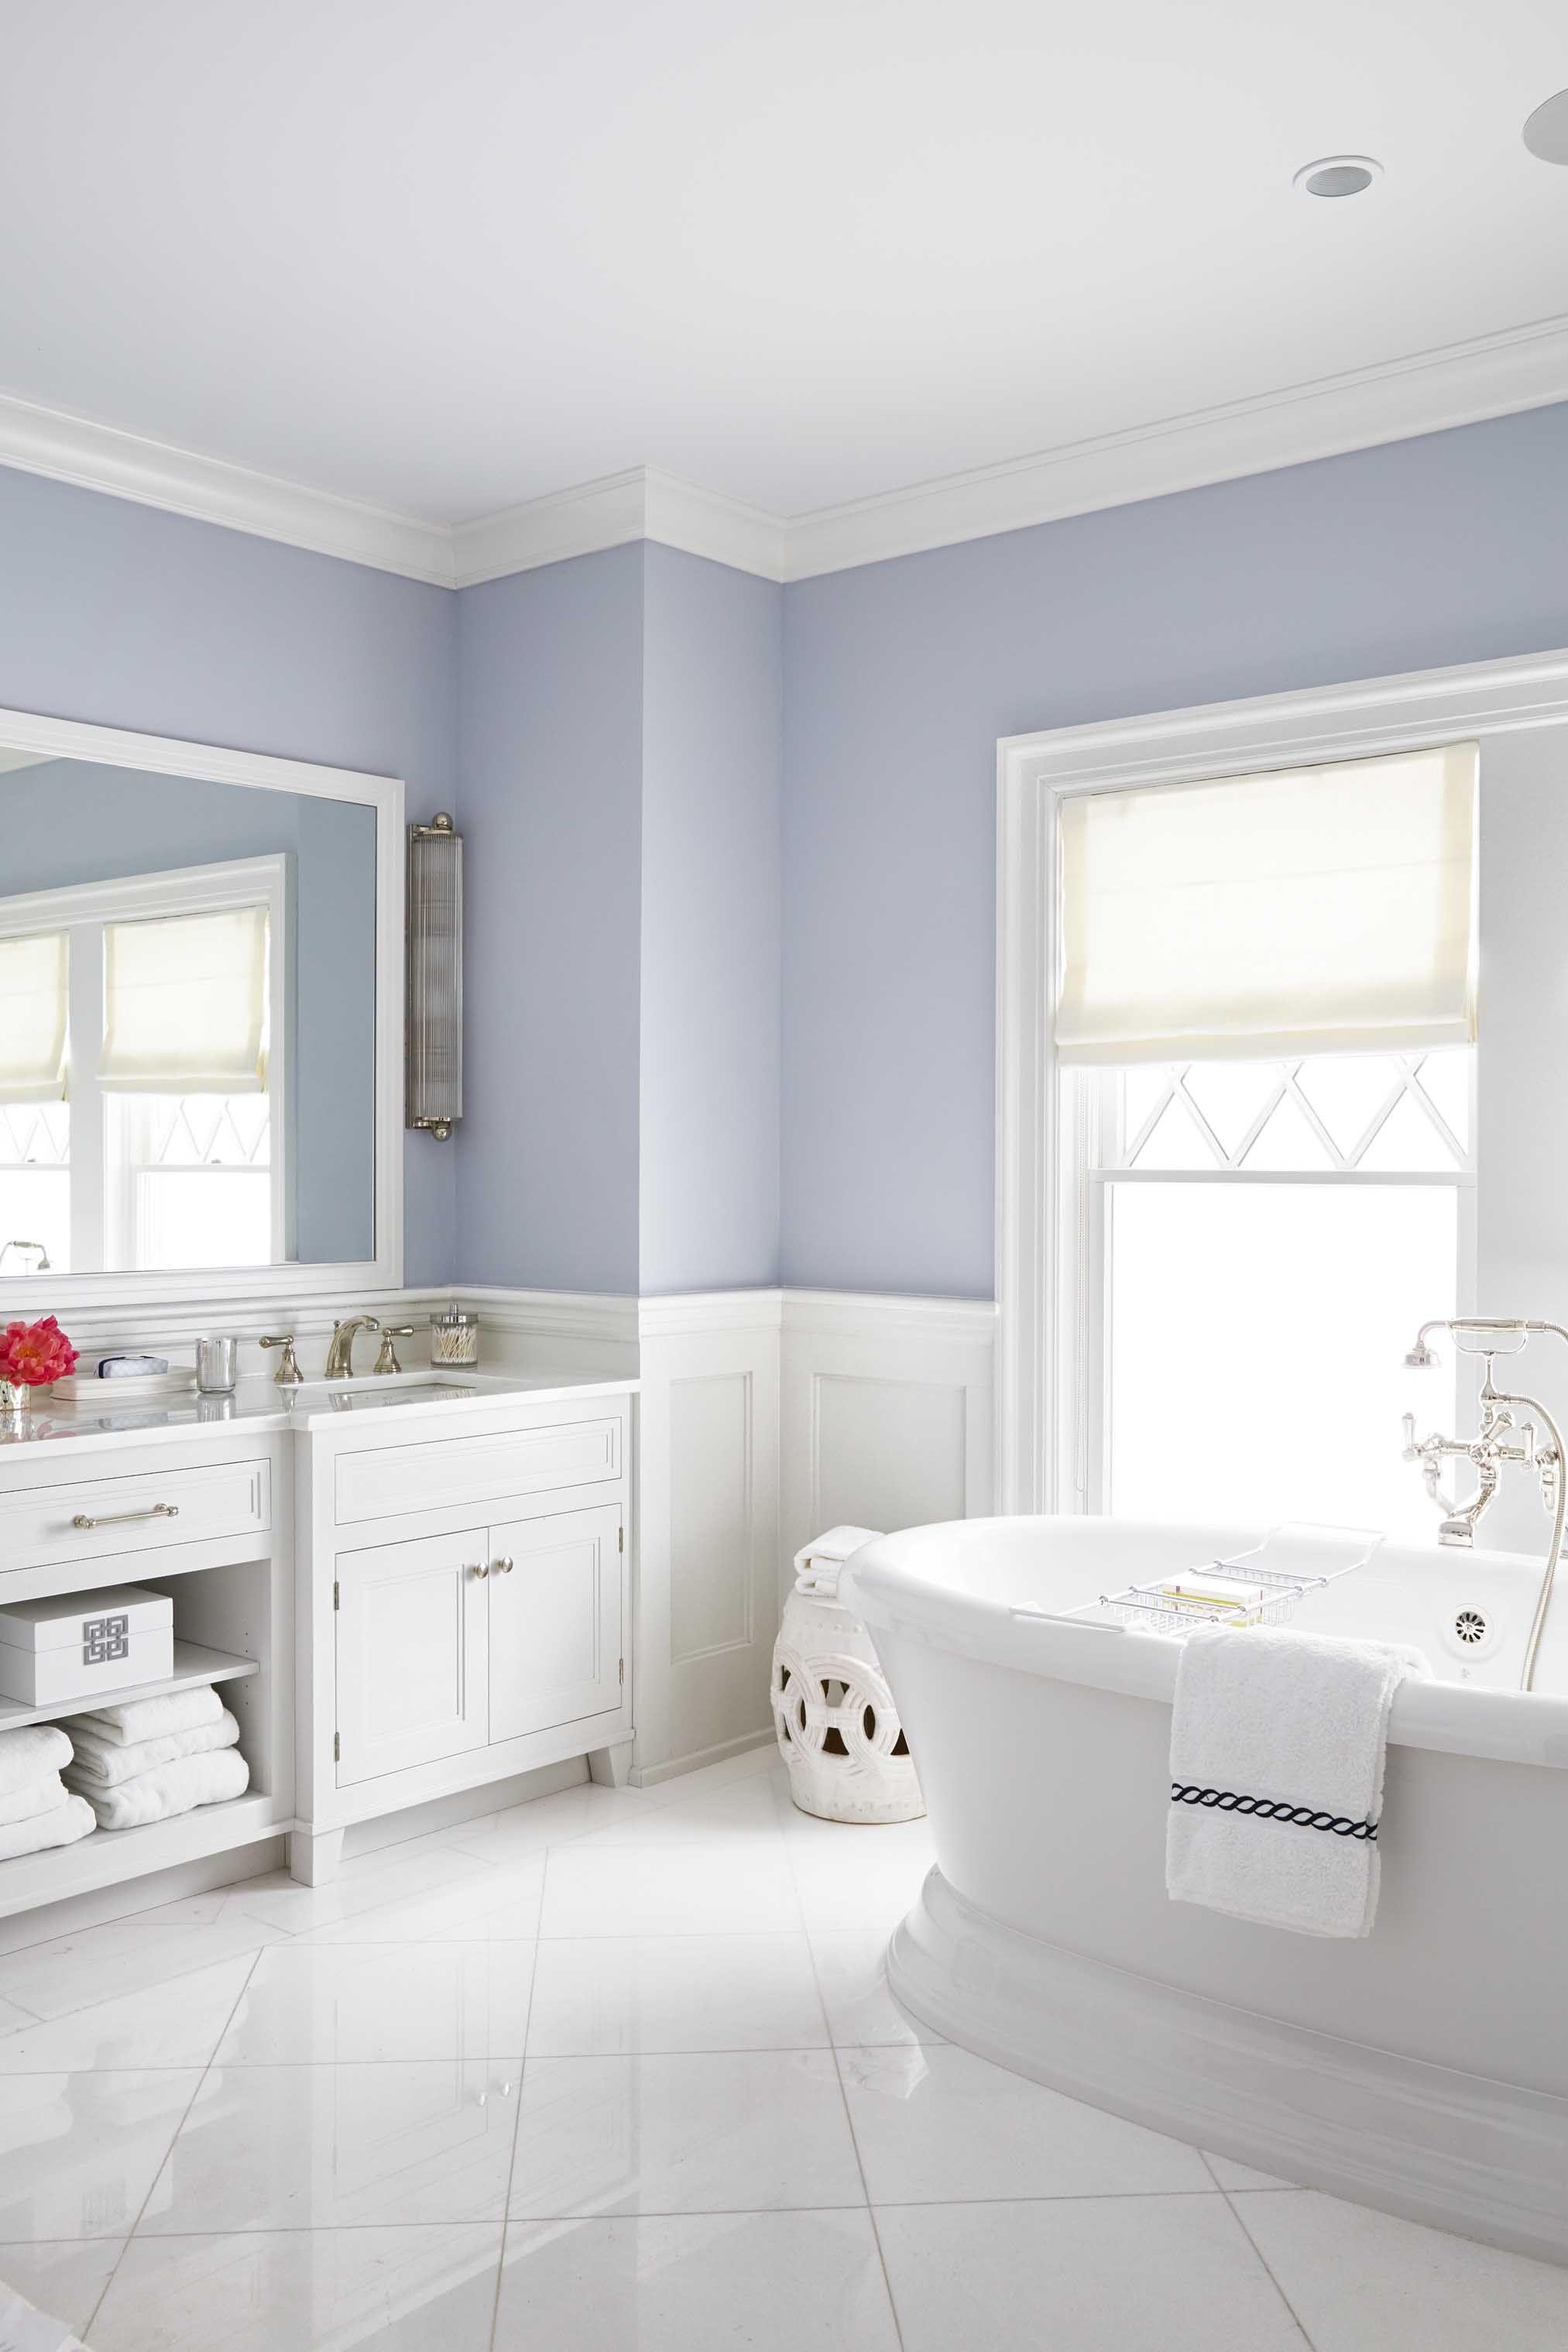 25 Best Bathroom Paint Colors Popular Ideas For Bathroom Wall Colors